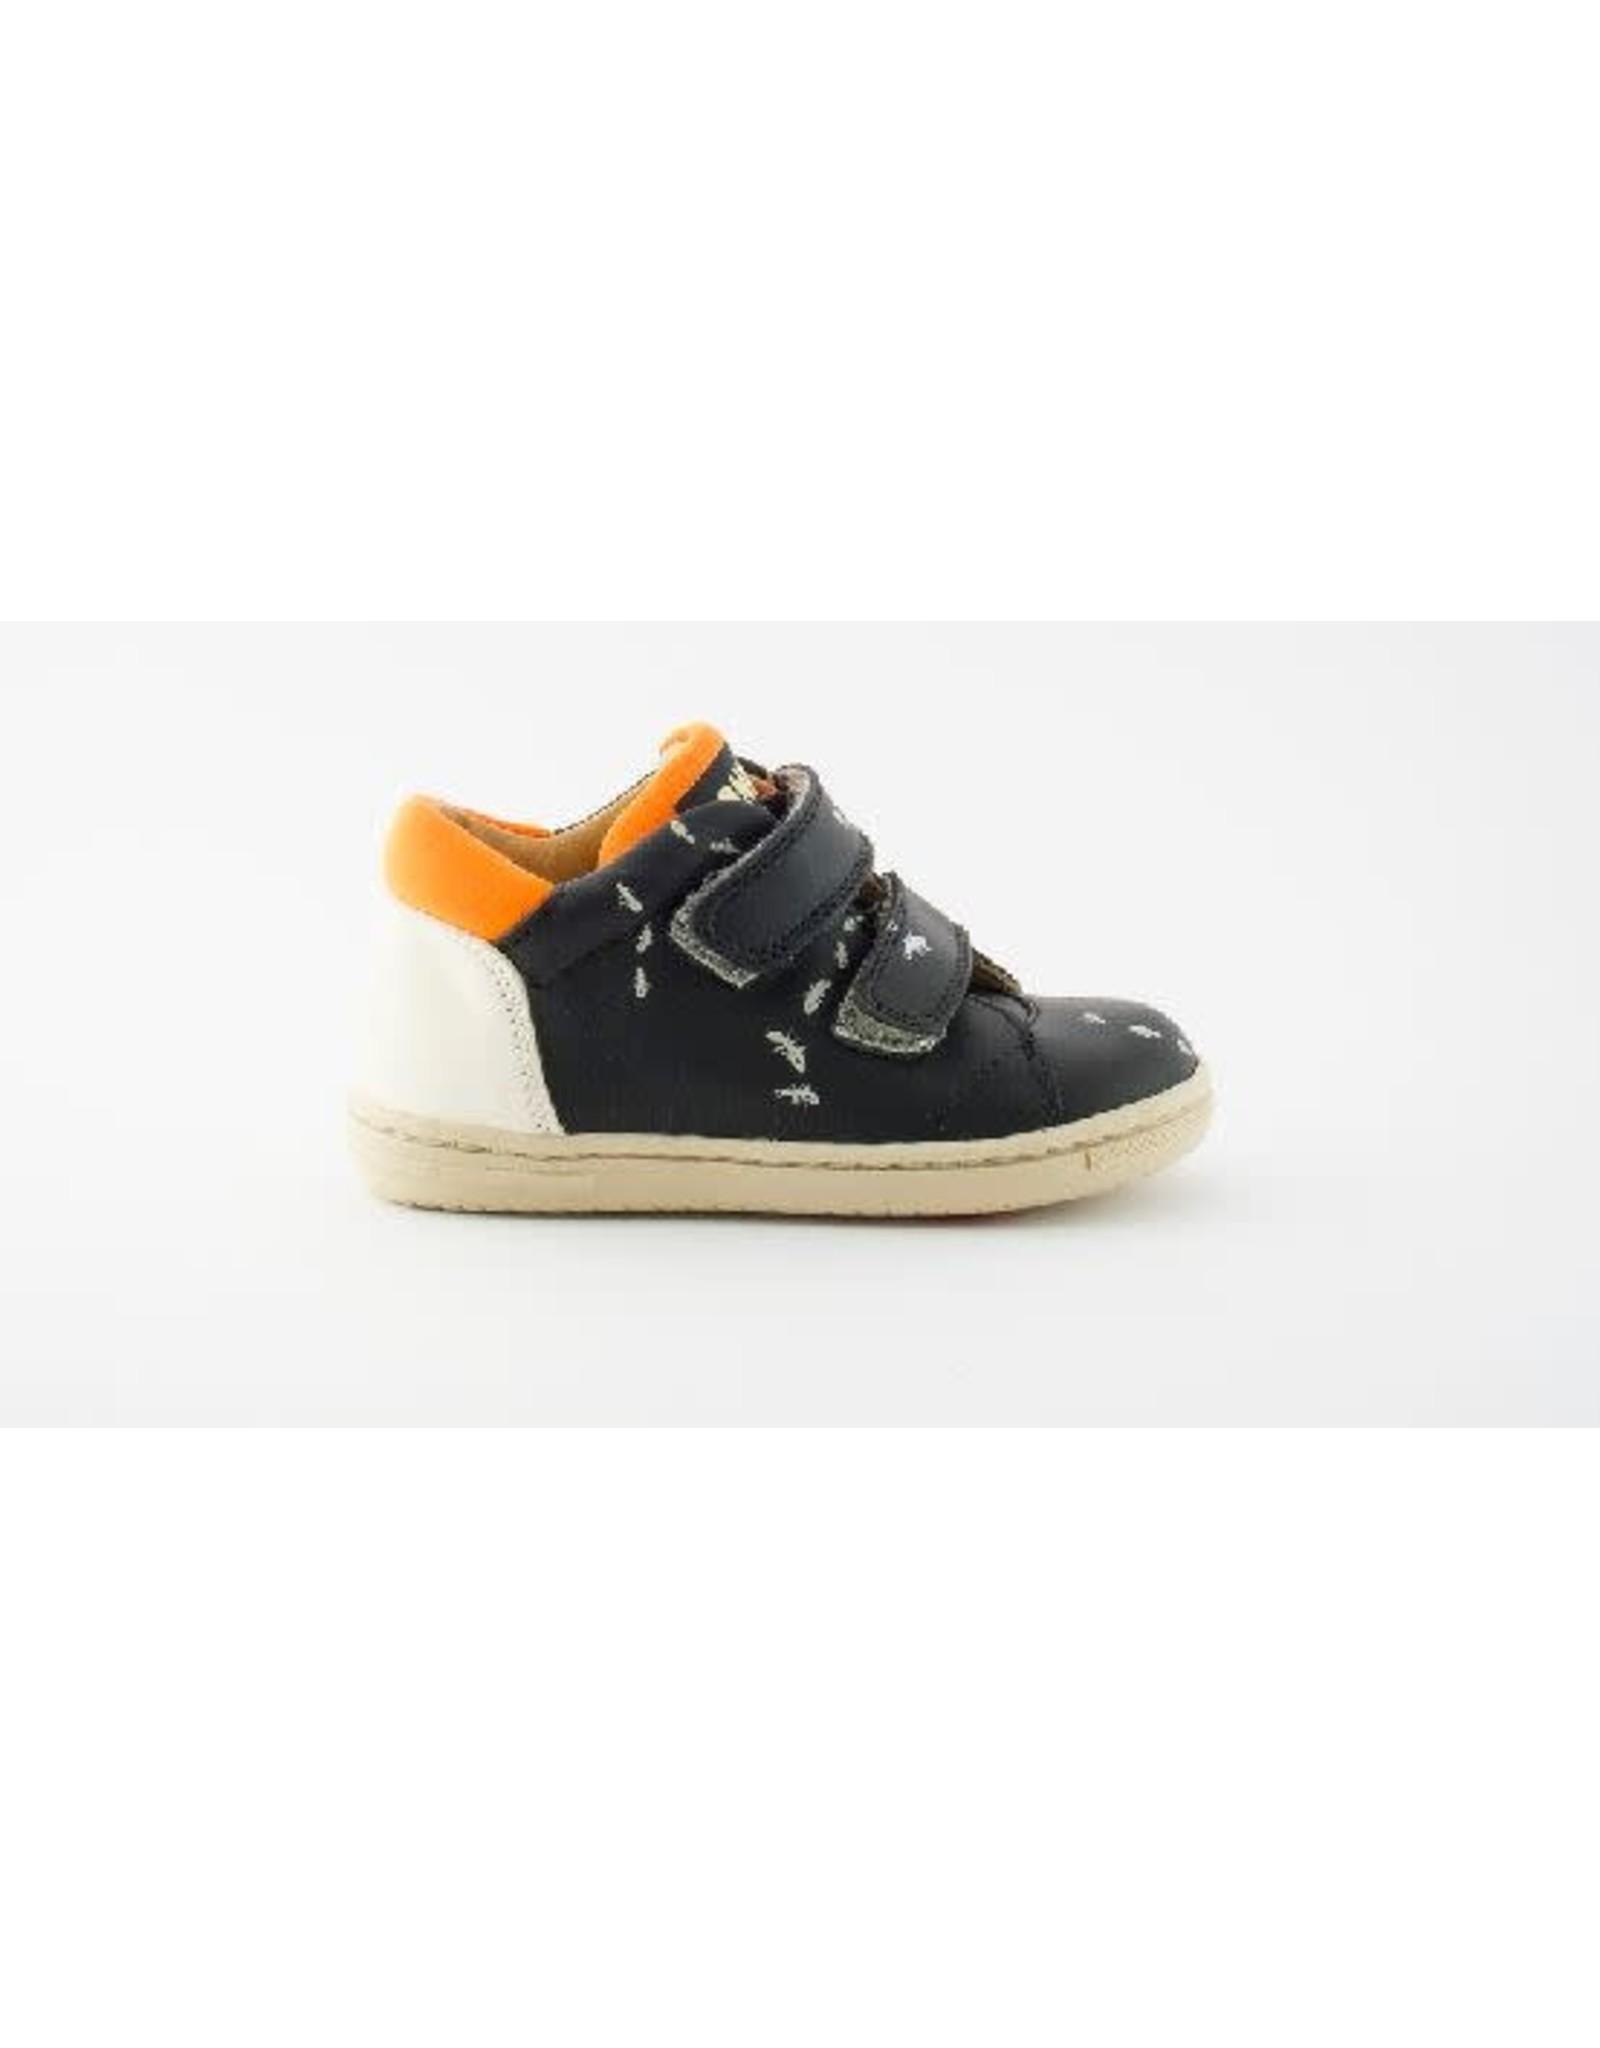 Rondinella sneaker velcro black ants